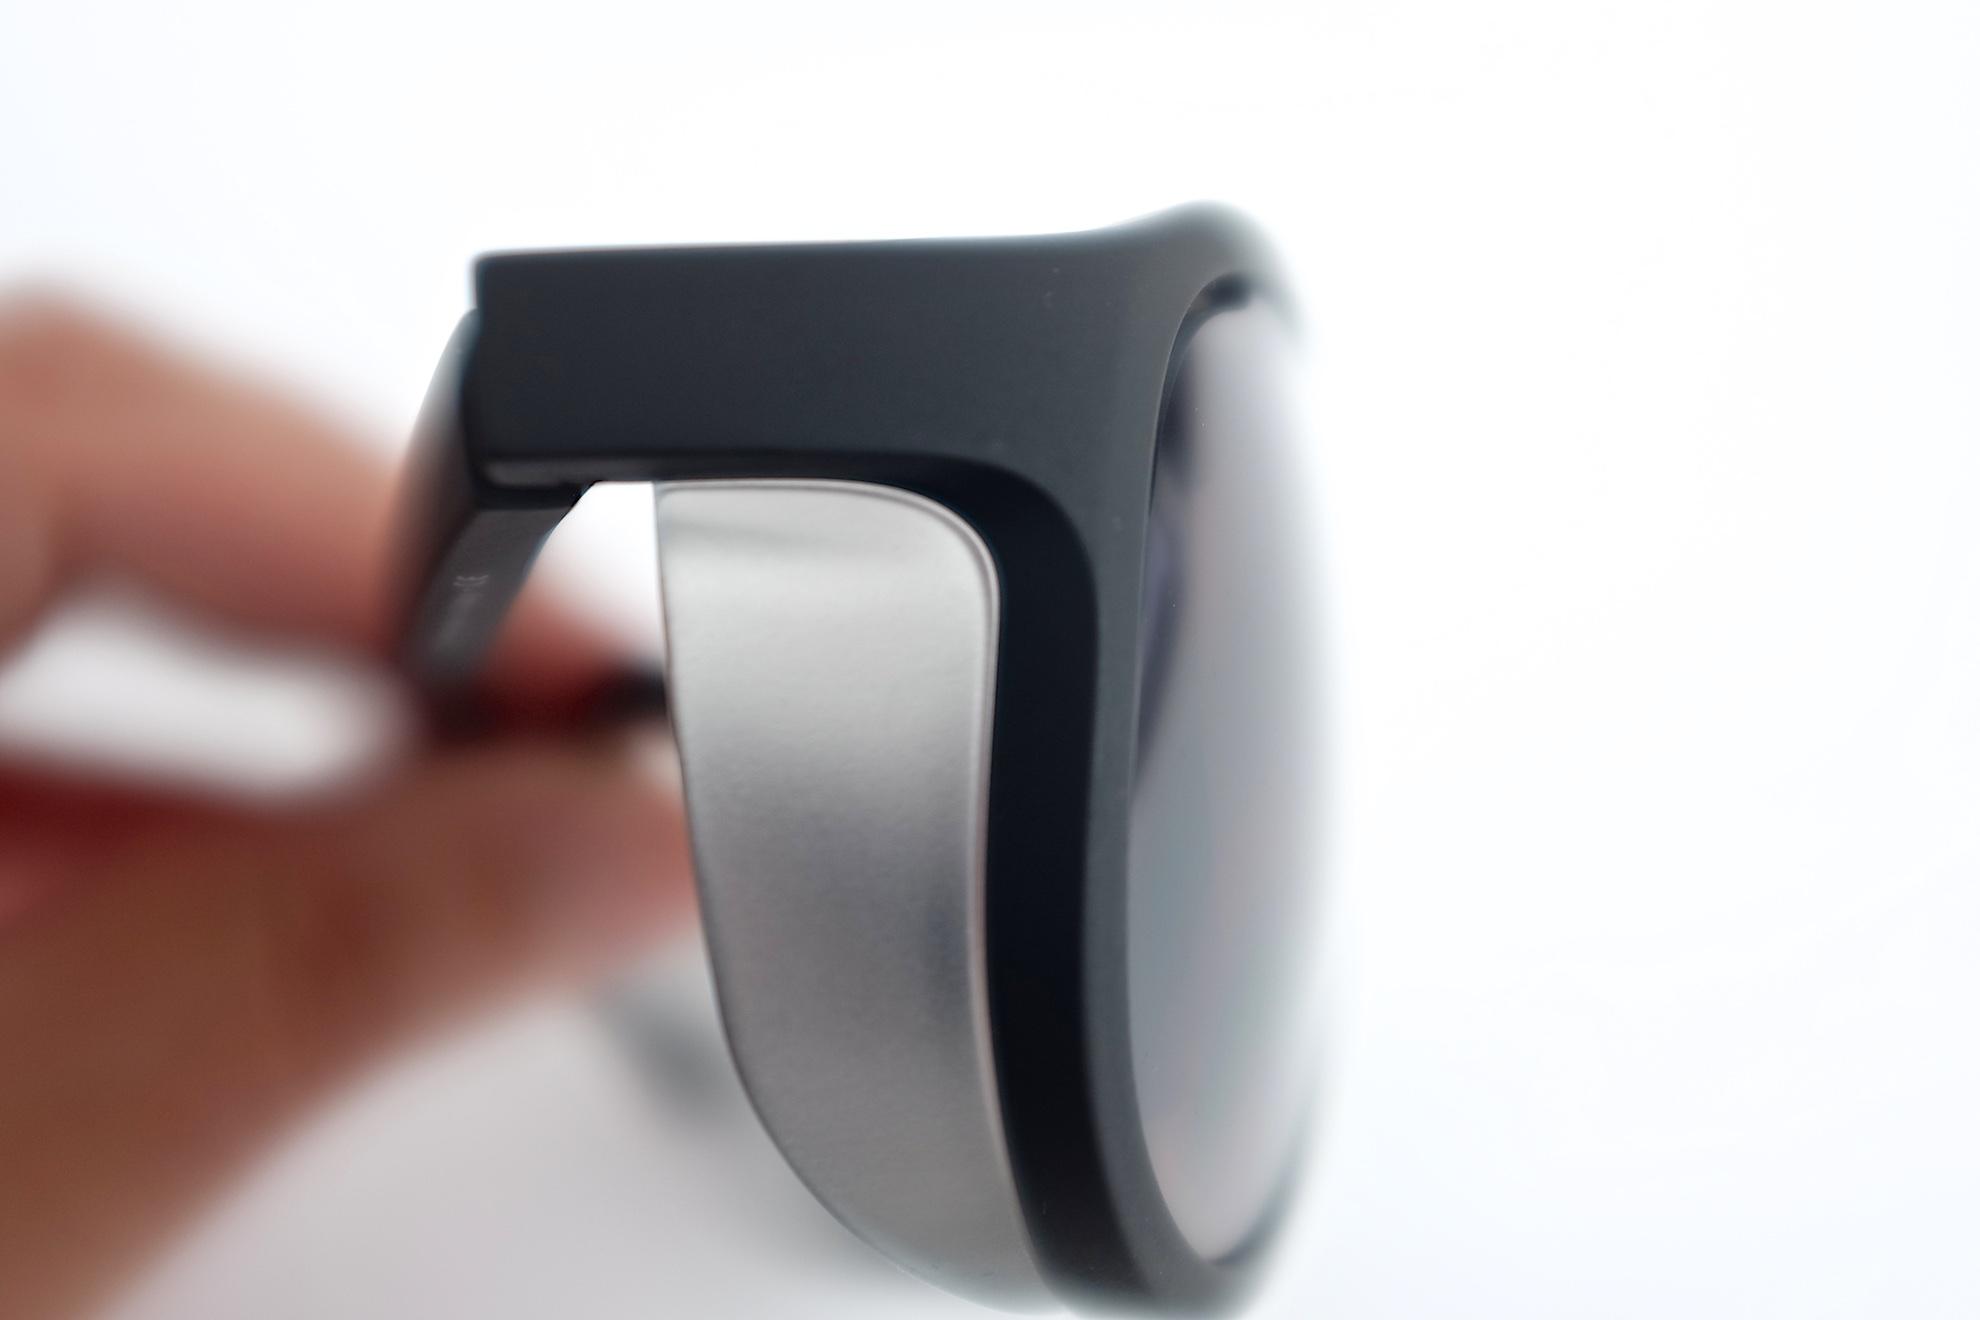 Albaoptics ποδηλατικά γυαλιά ηλίου